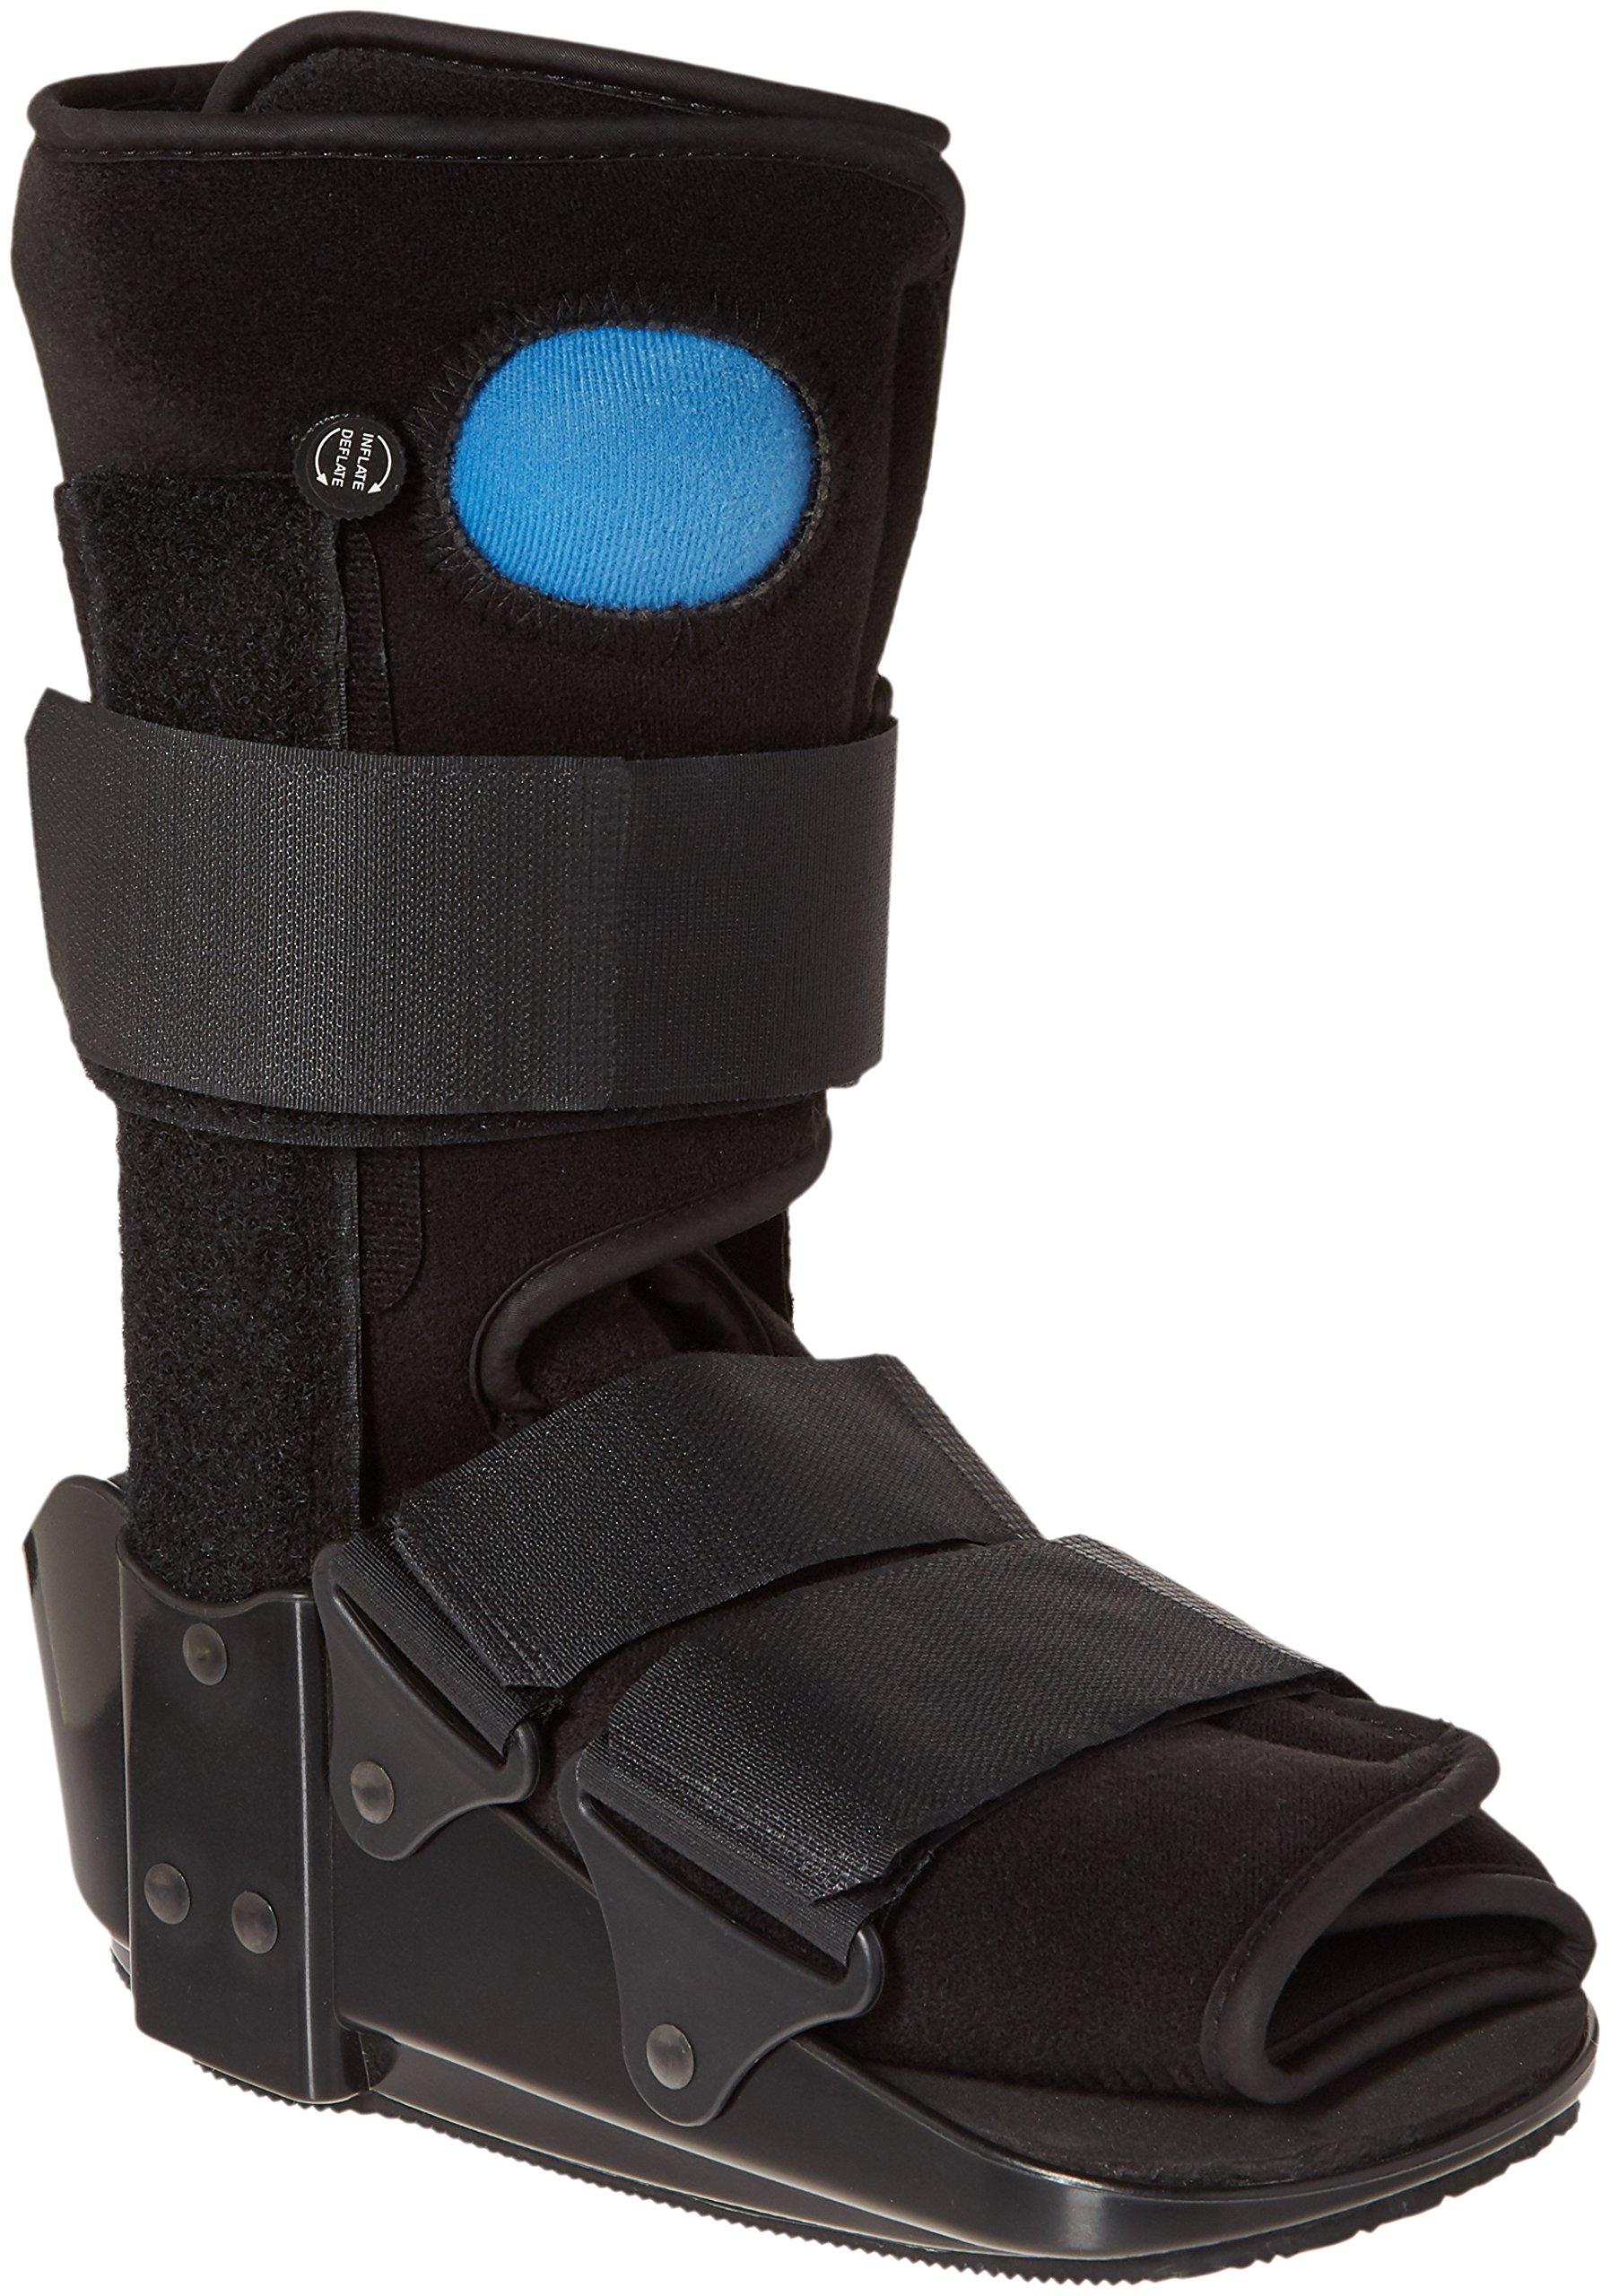 OTC Short Leg Adjustable Air Cast Low Top Walker Boot, Black, Small by OTC